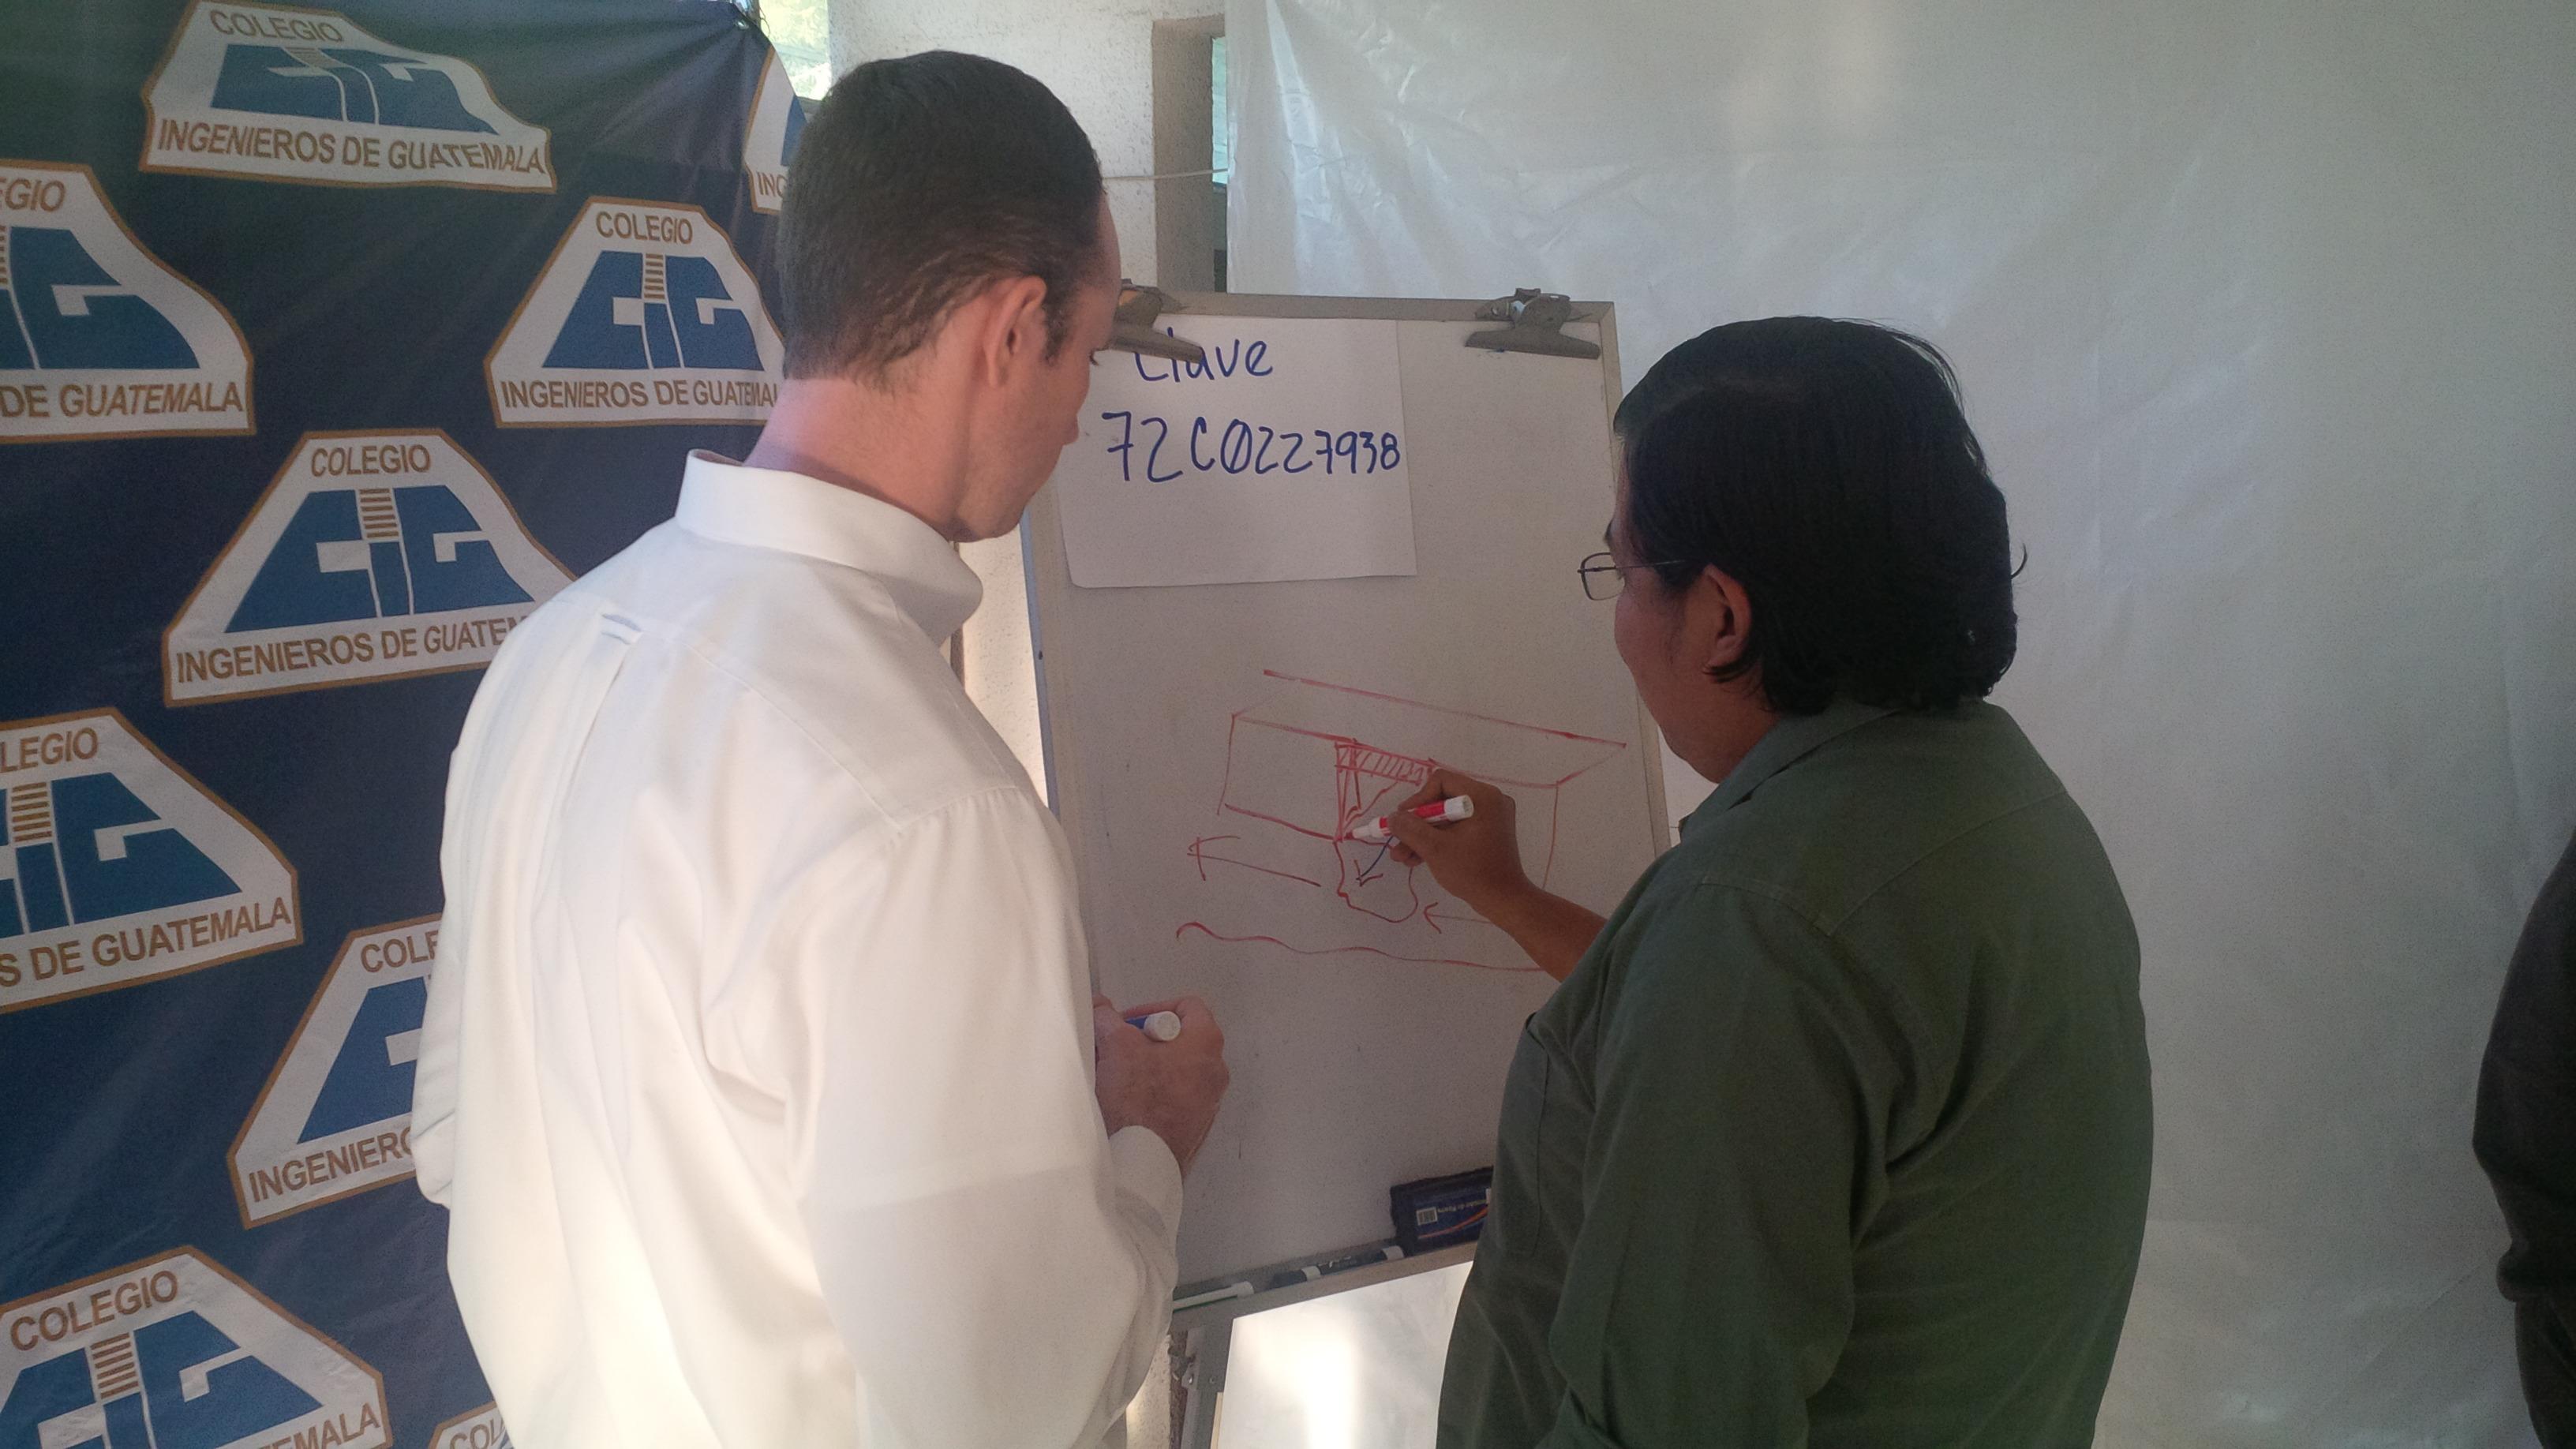 HEC Hydraulic Engineers Lead Training in Guatemala